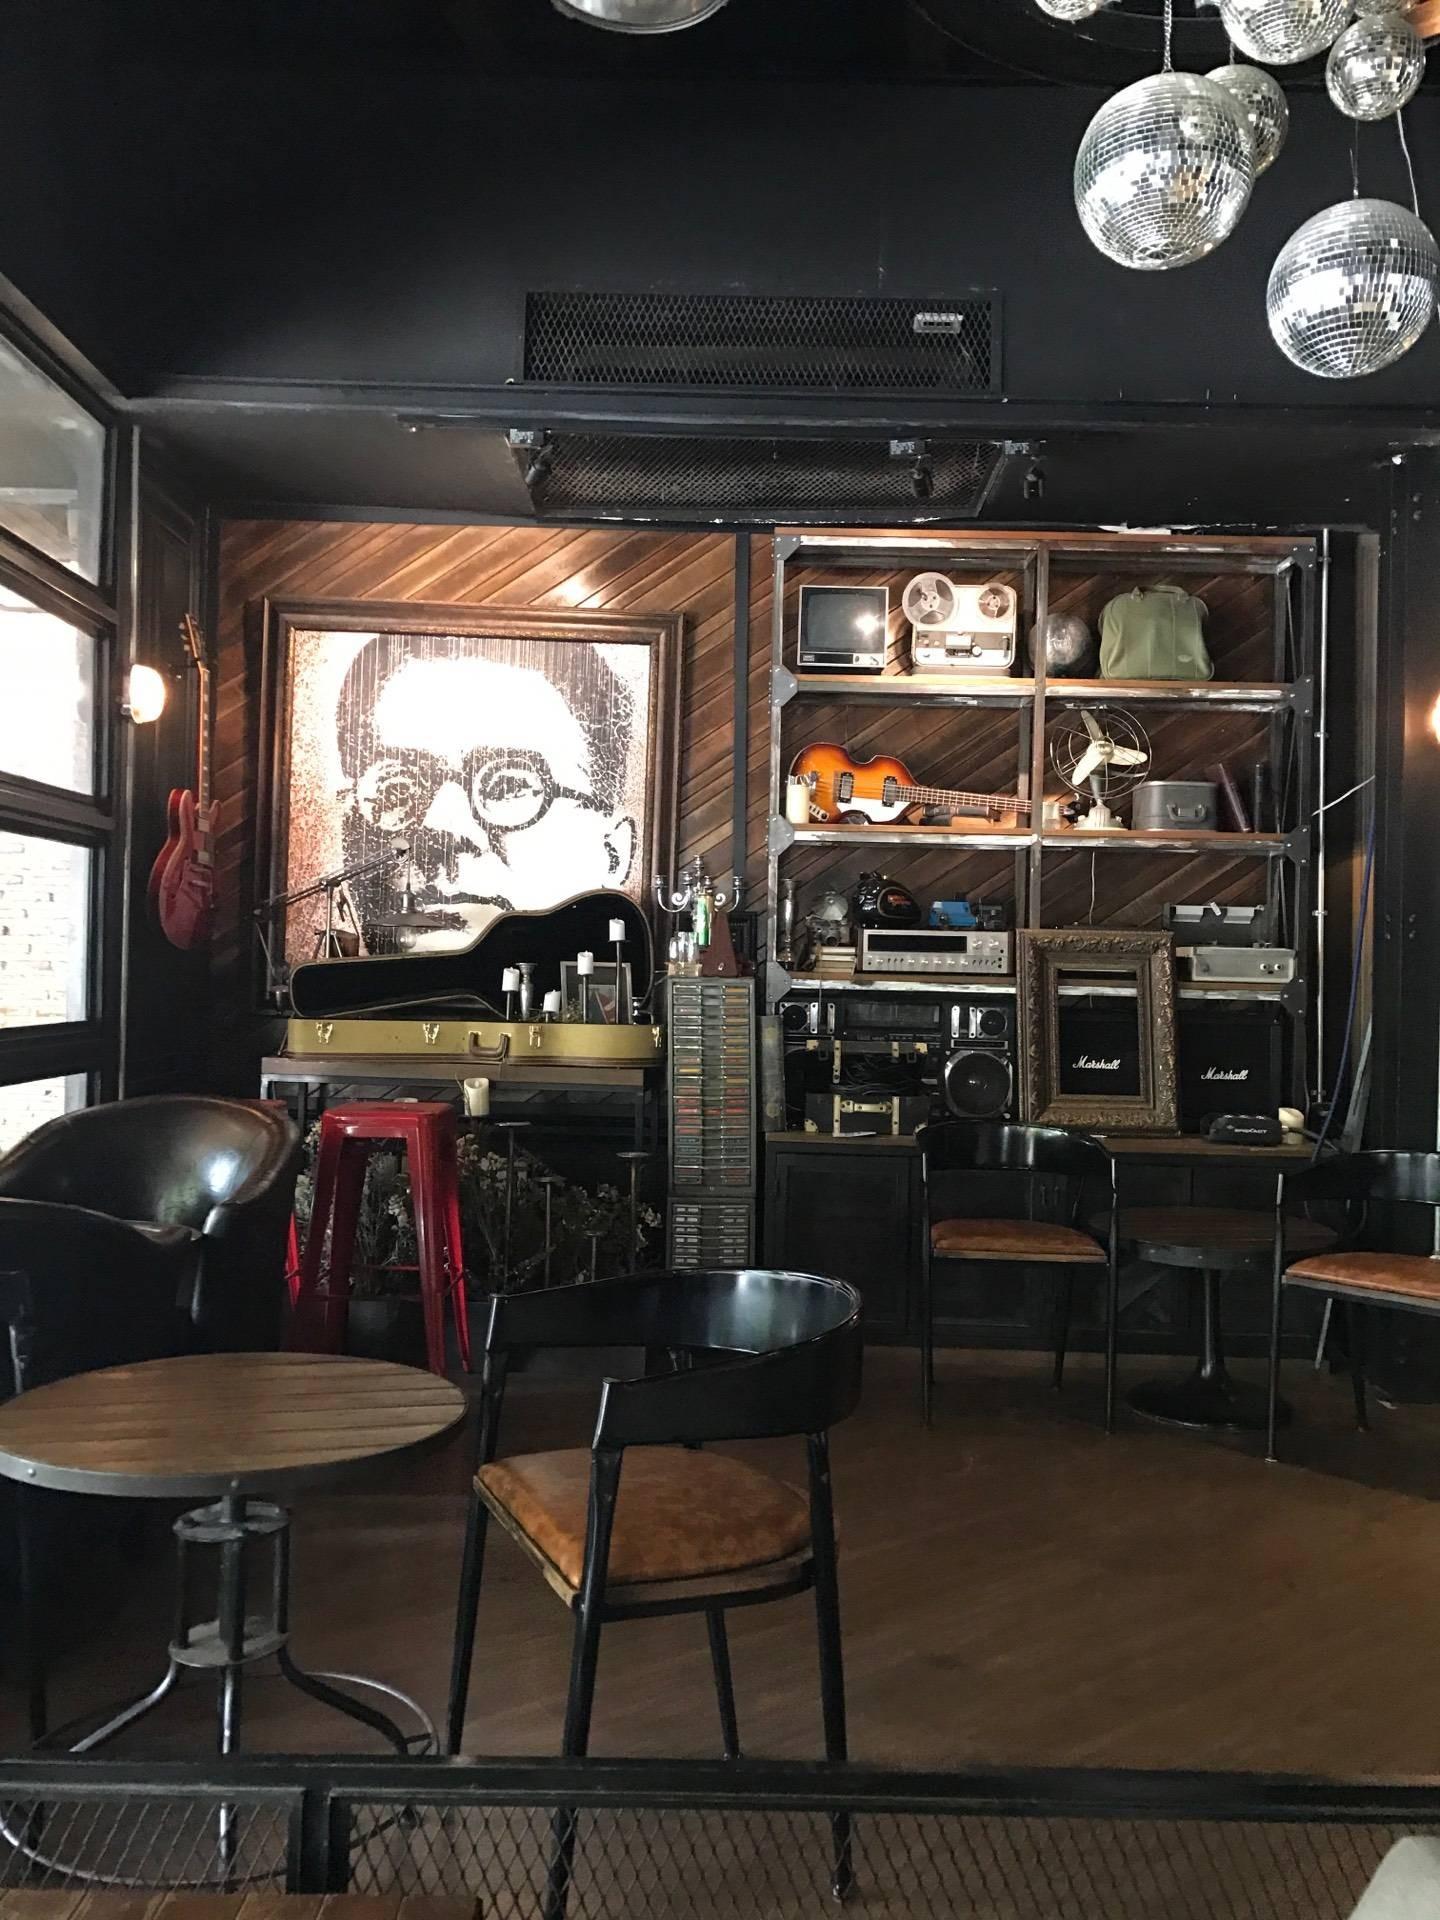 Oldman Café บางขุนนนท์